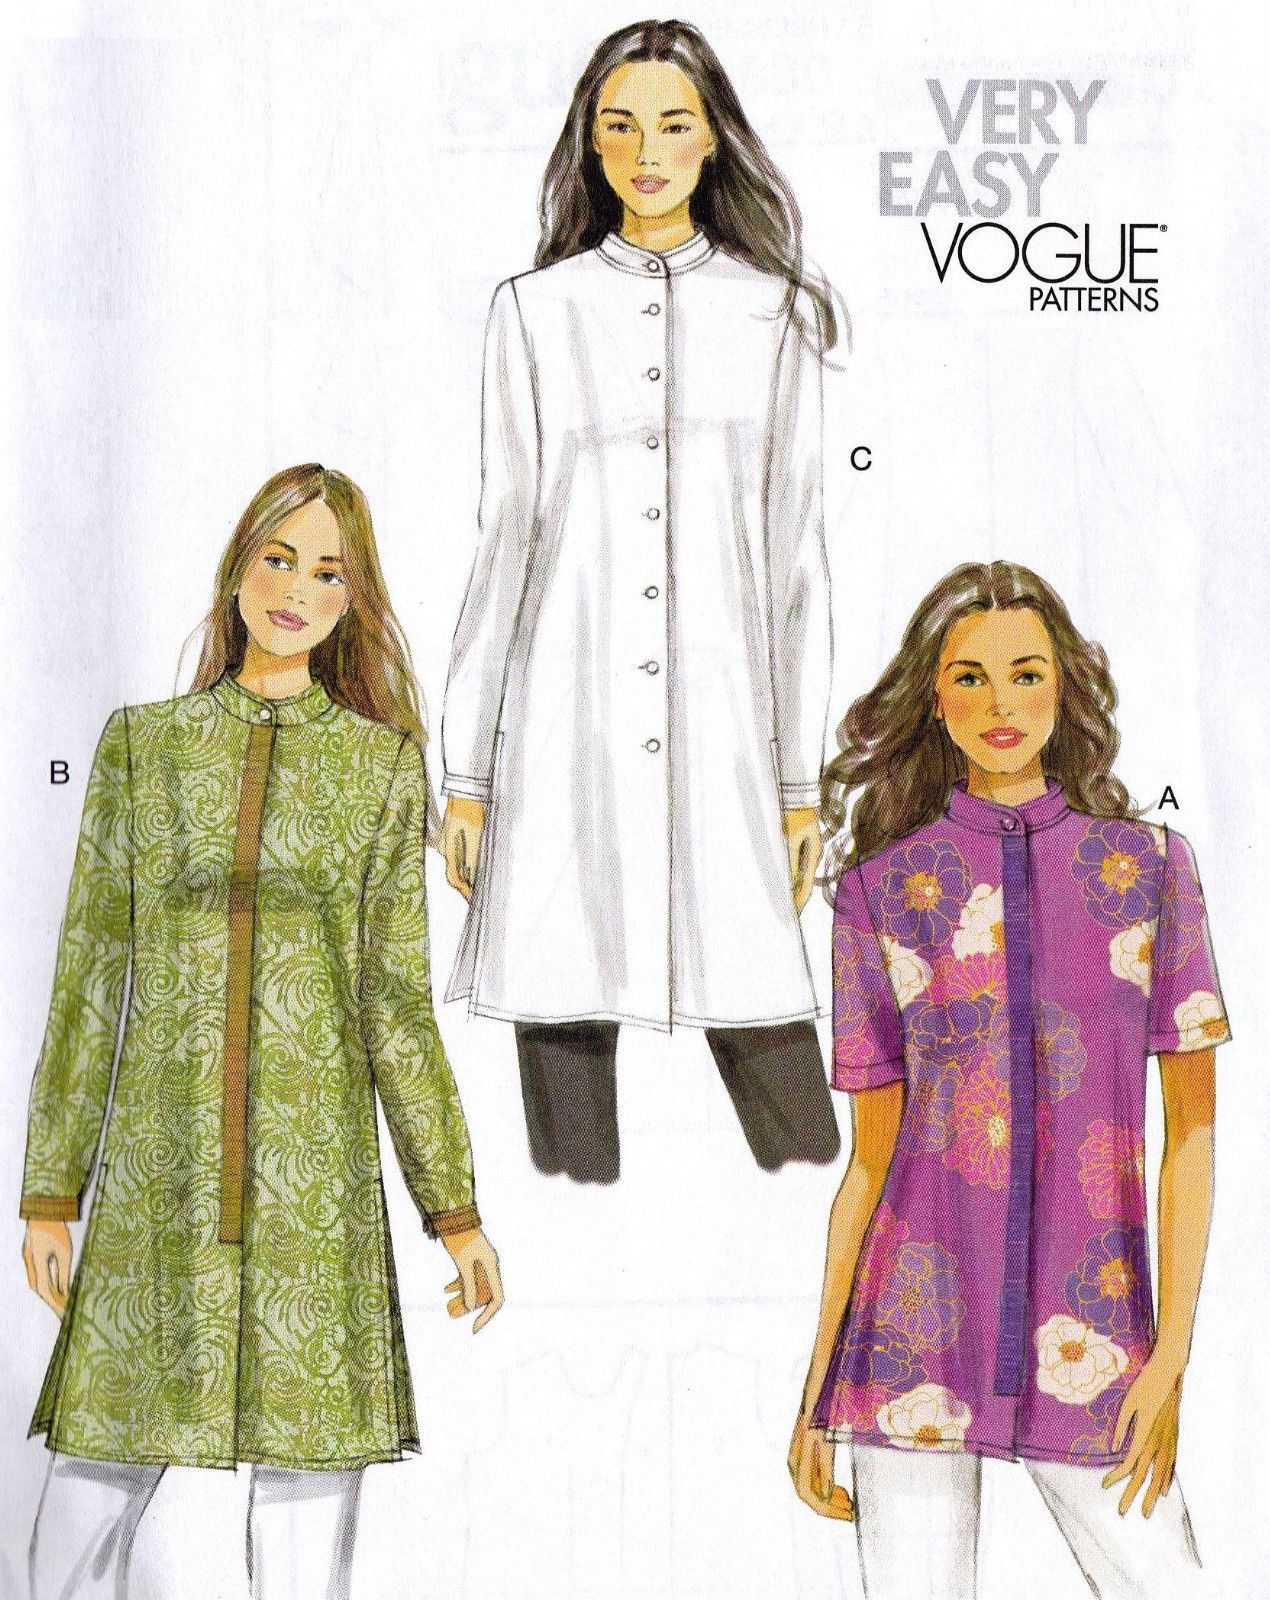 Vogue Sew Pattern 8830 EZ Sew Tunic Top Mandarin Collar 8-24 Woman Plus